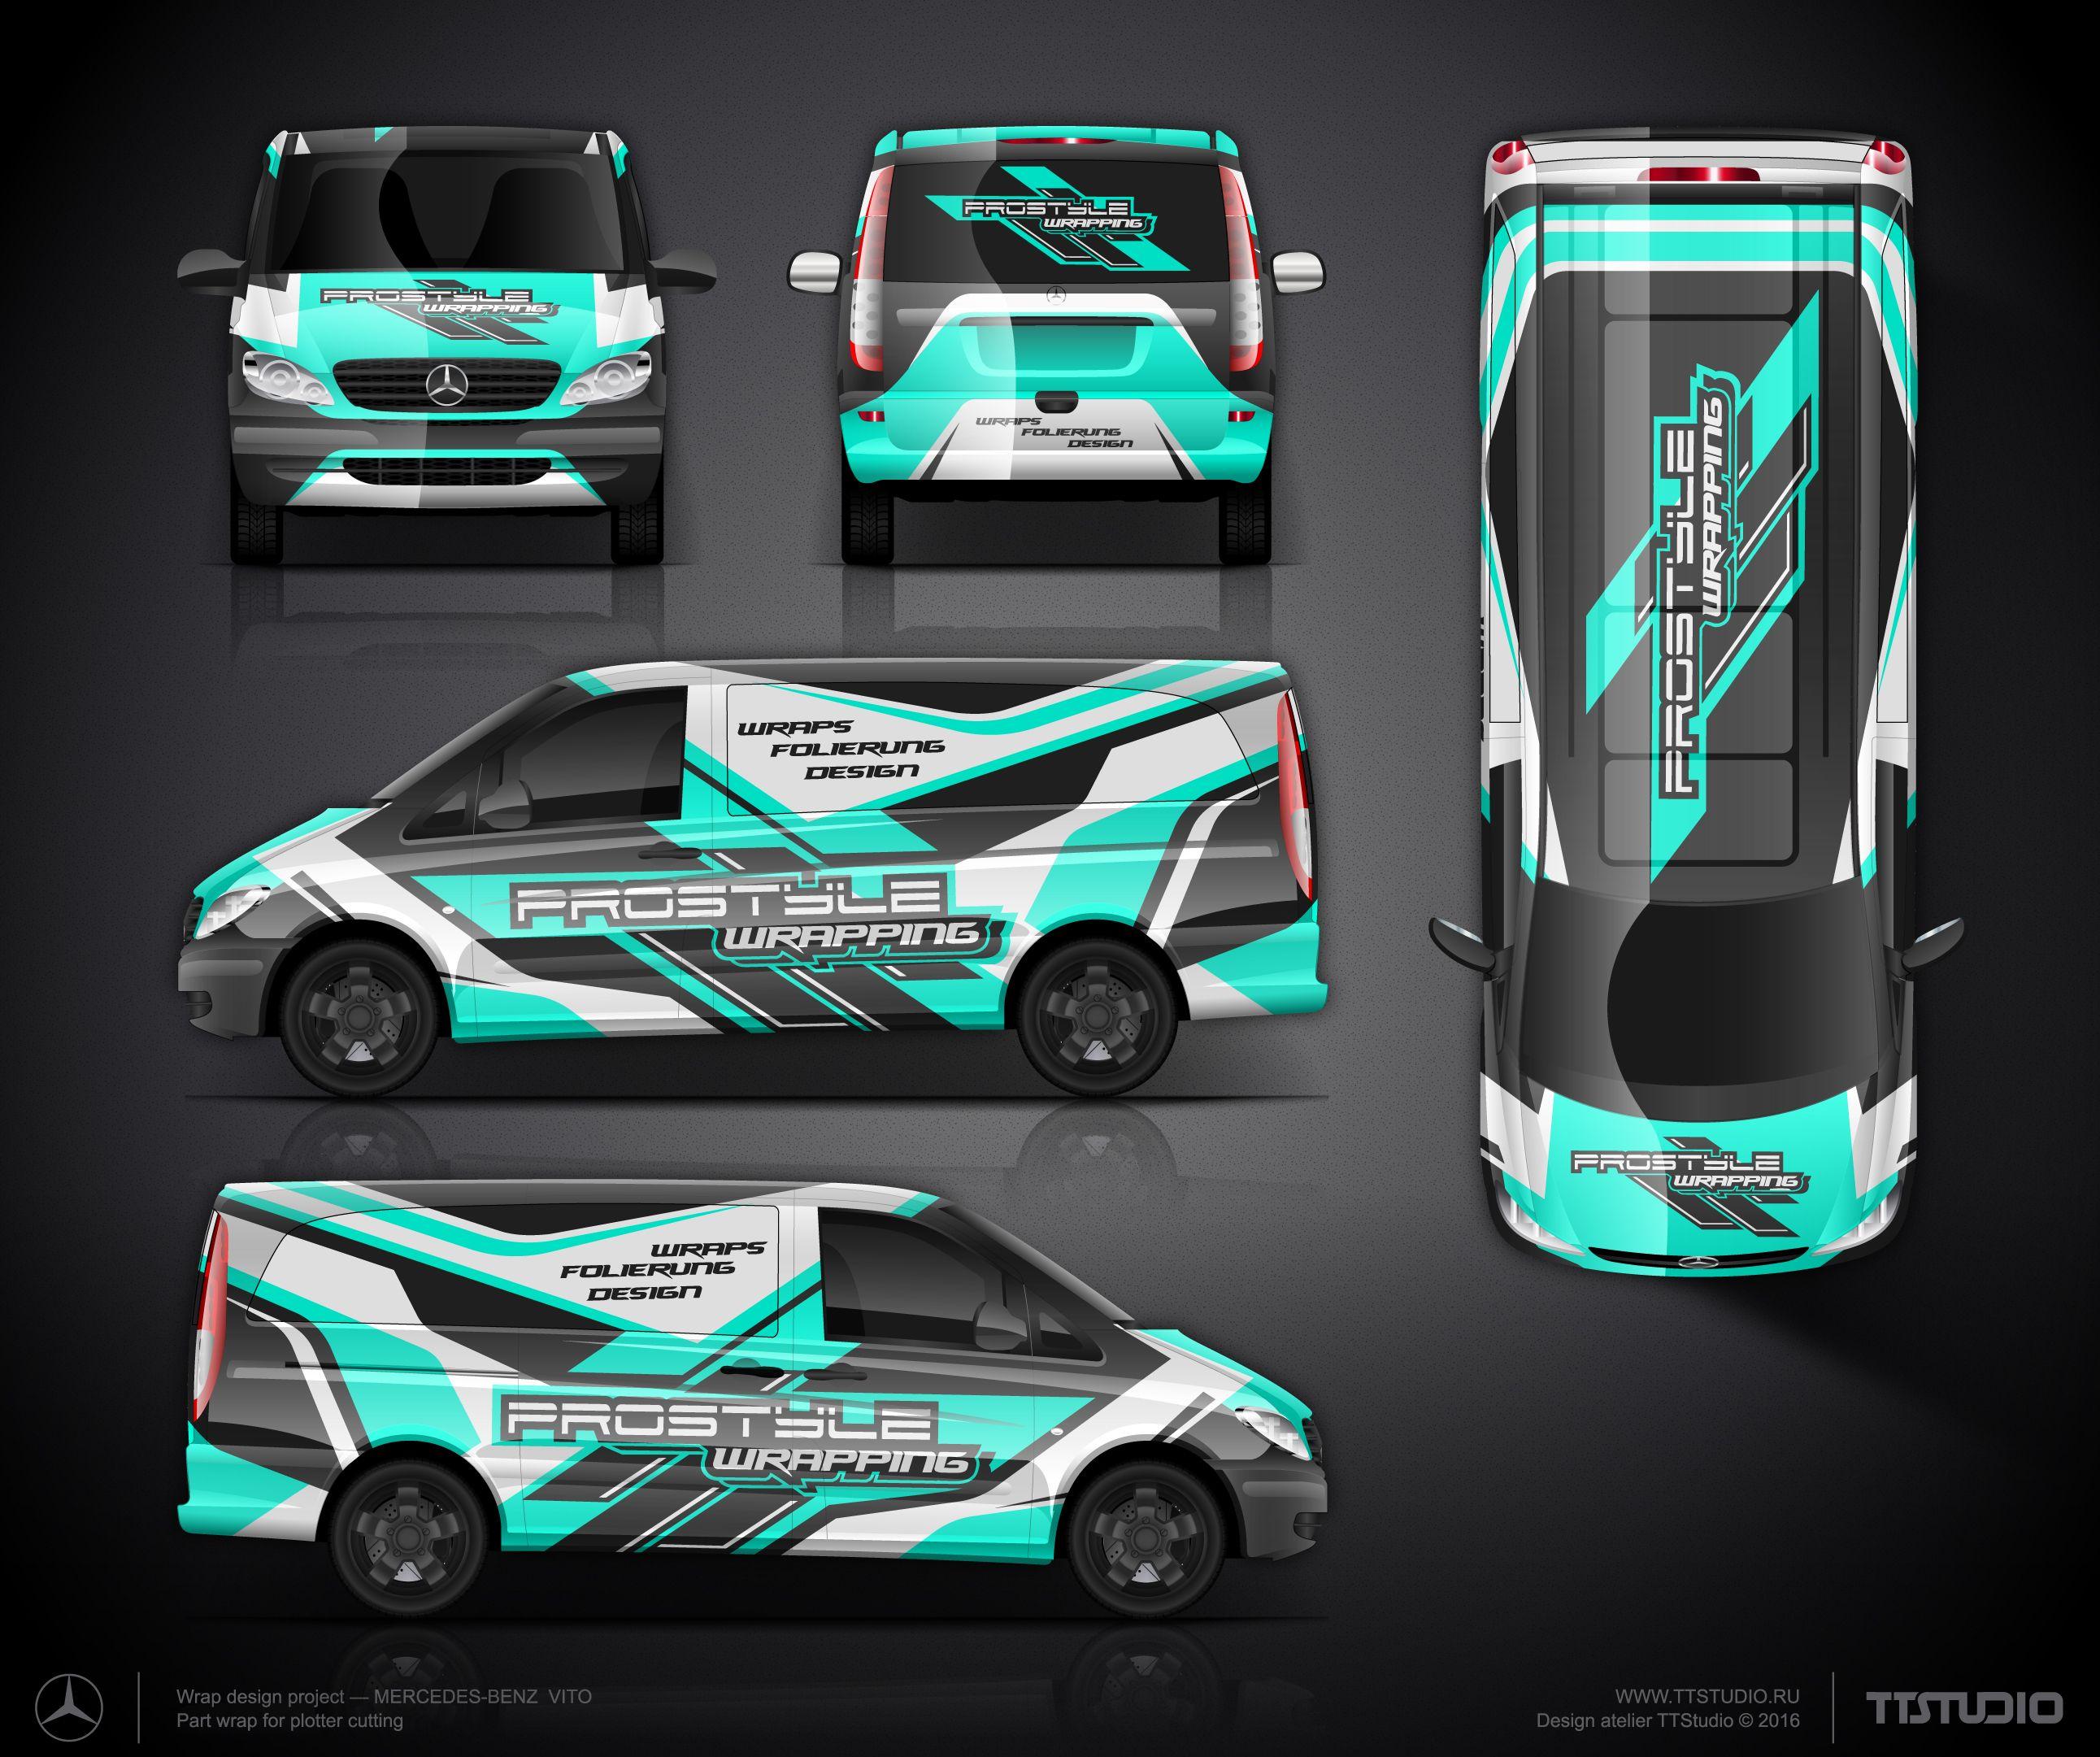 Mercedes prostyle wrapping jpg 2583x2161 van signage van design logo design